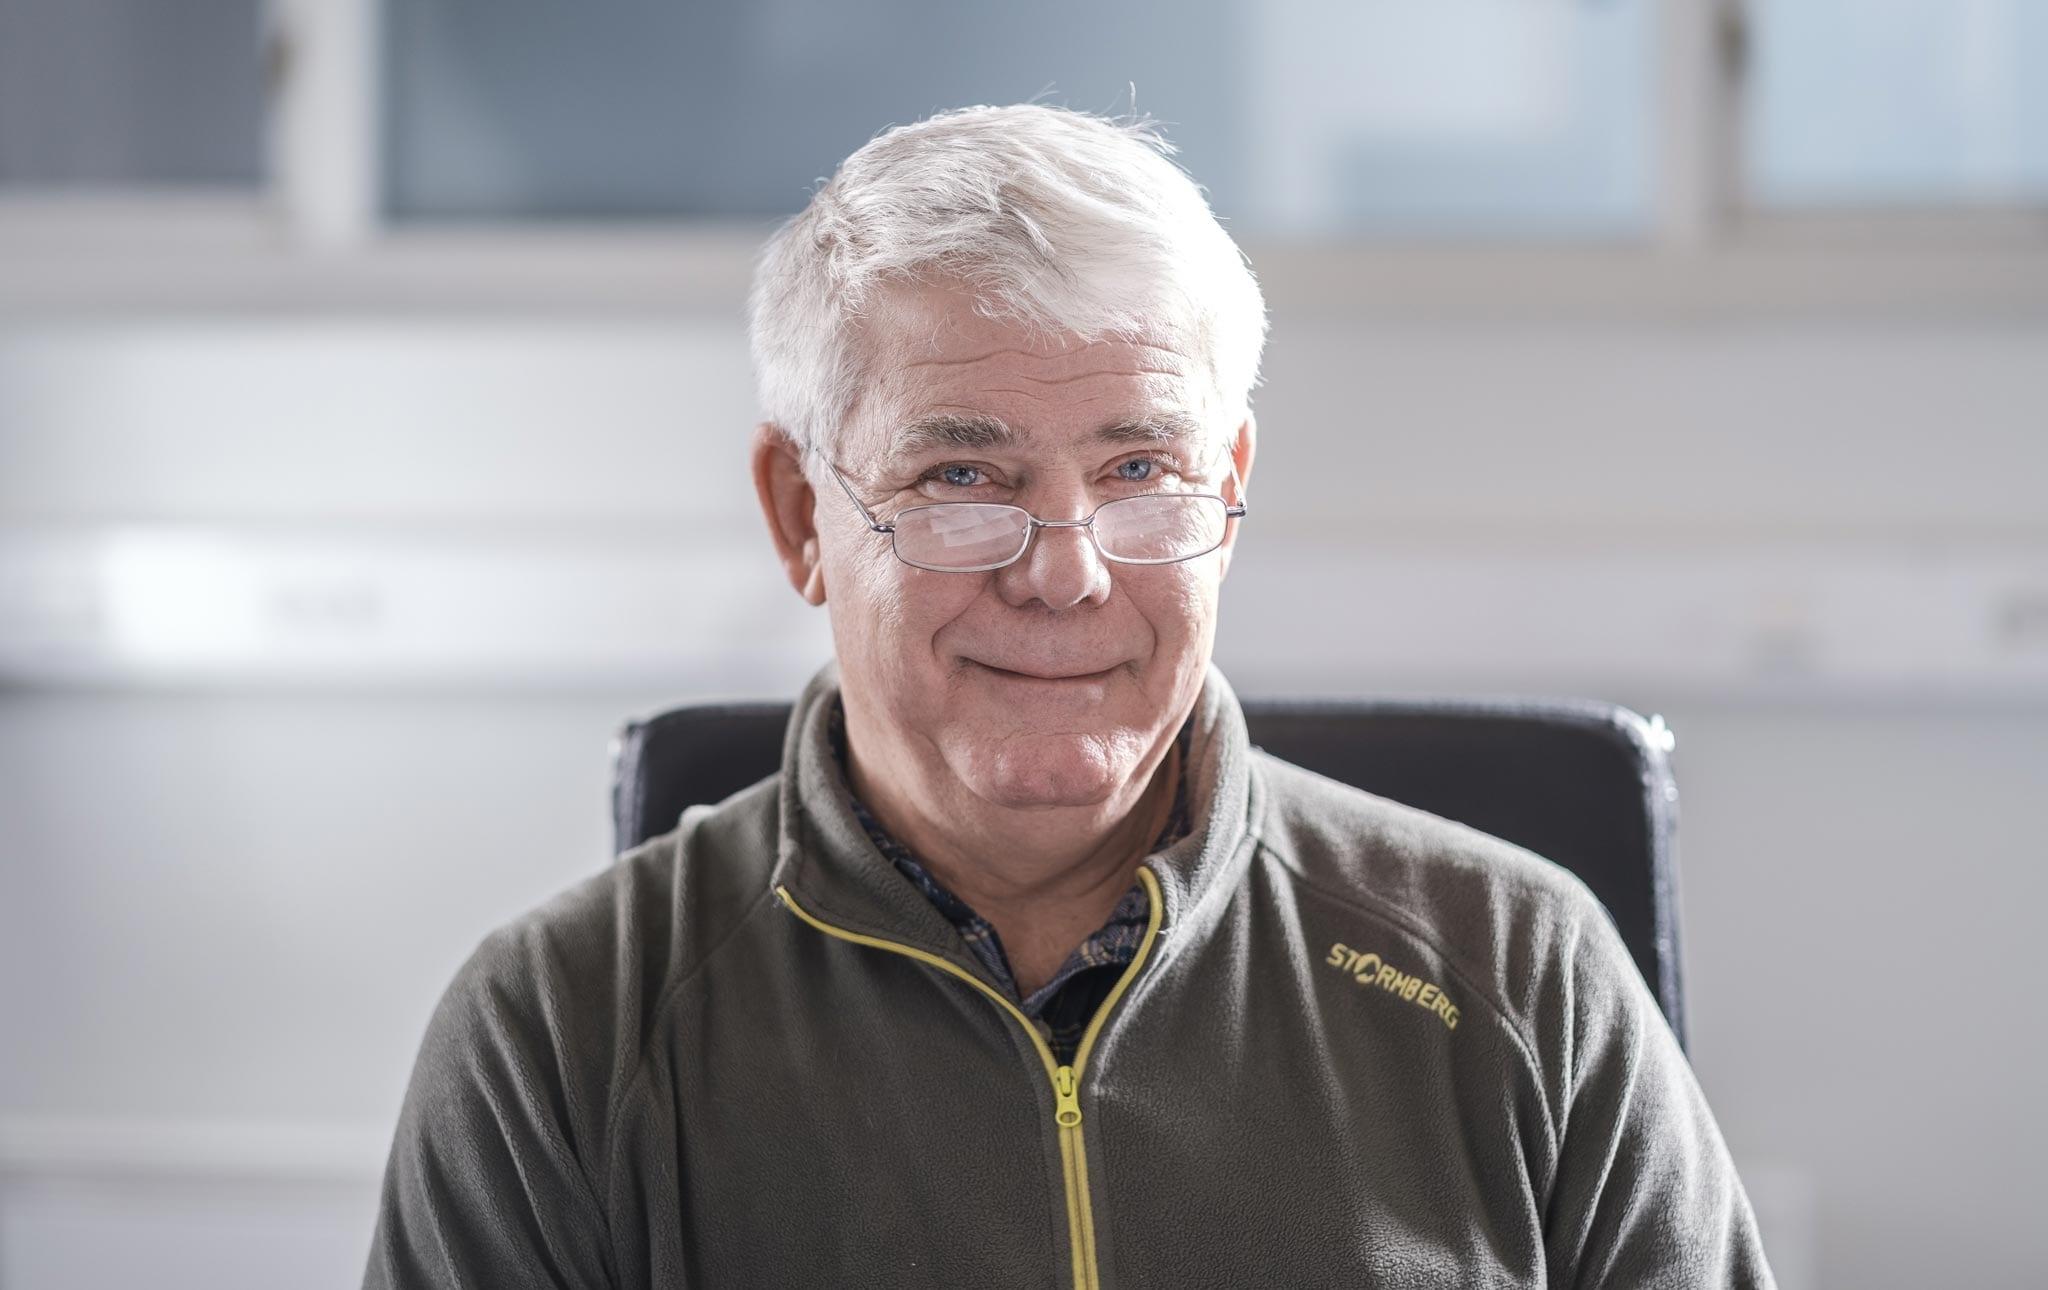 Svenn Erik Krog